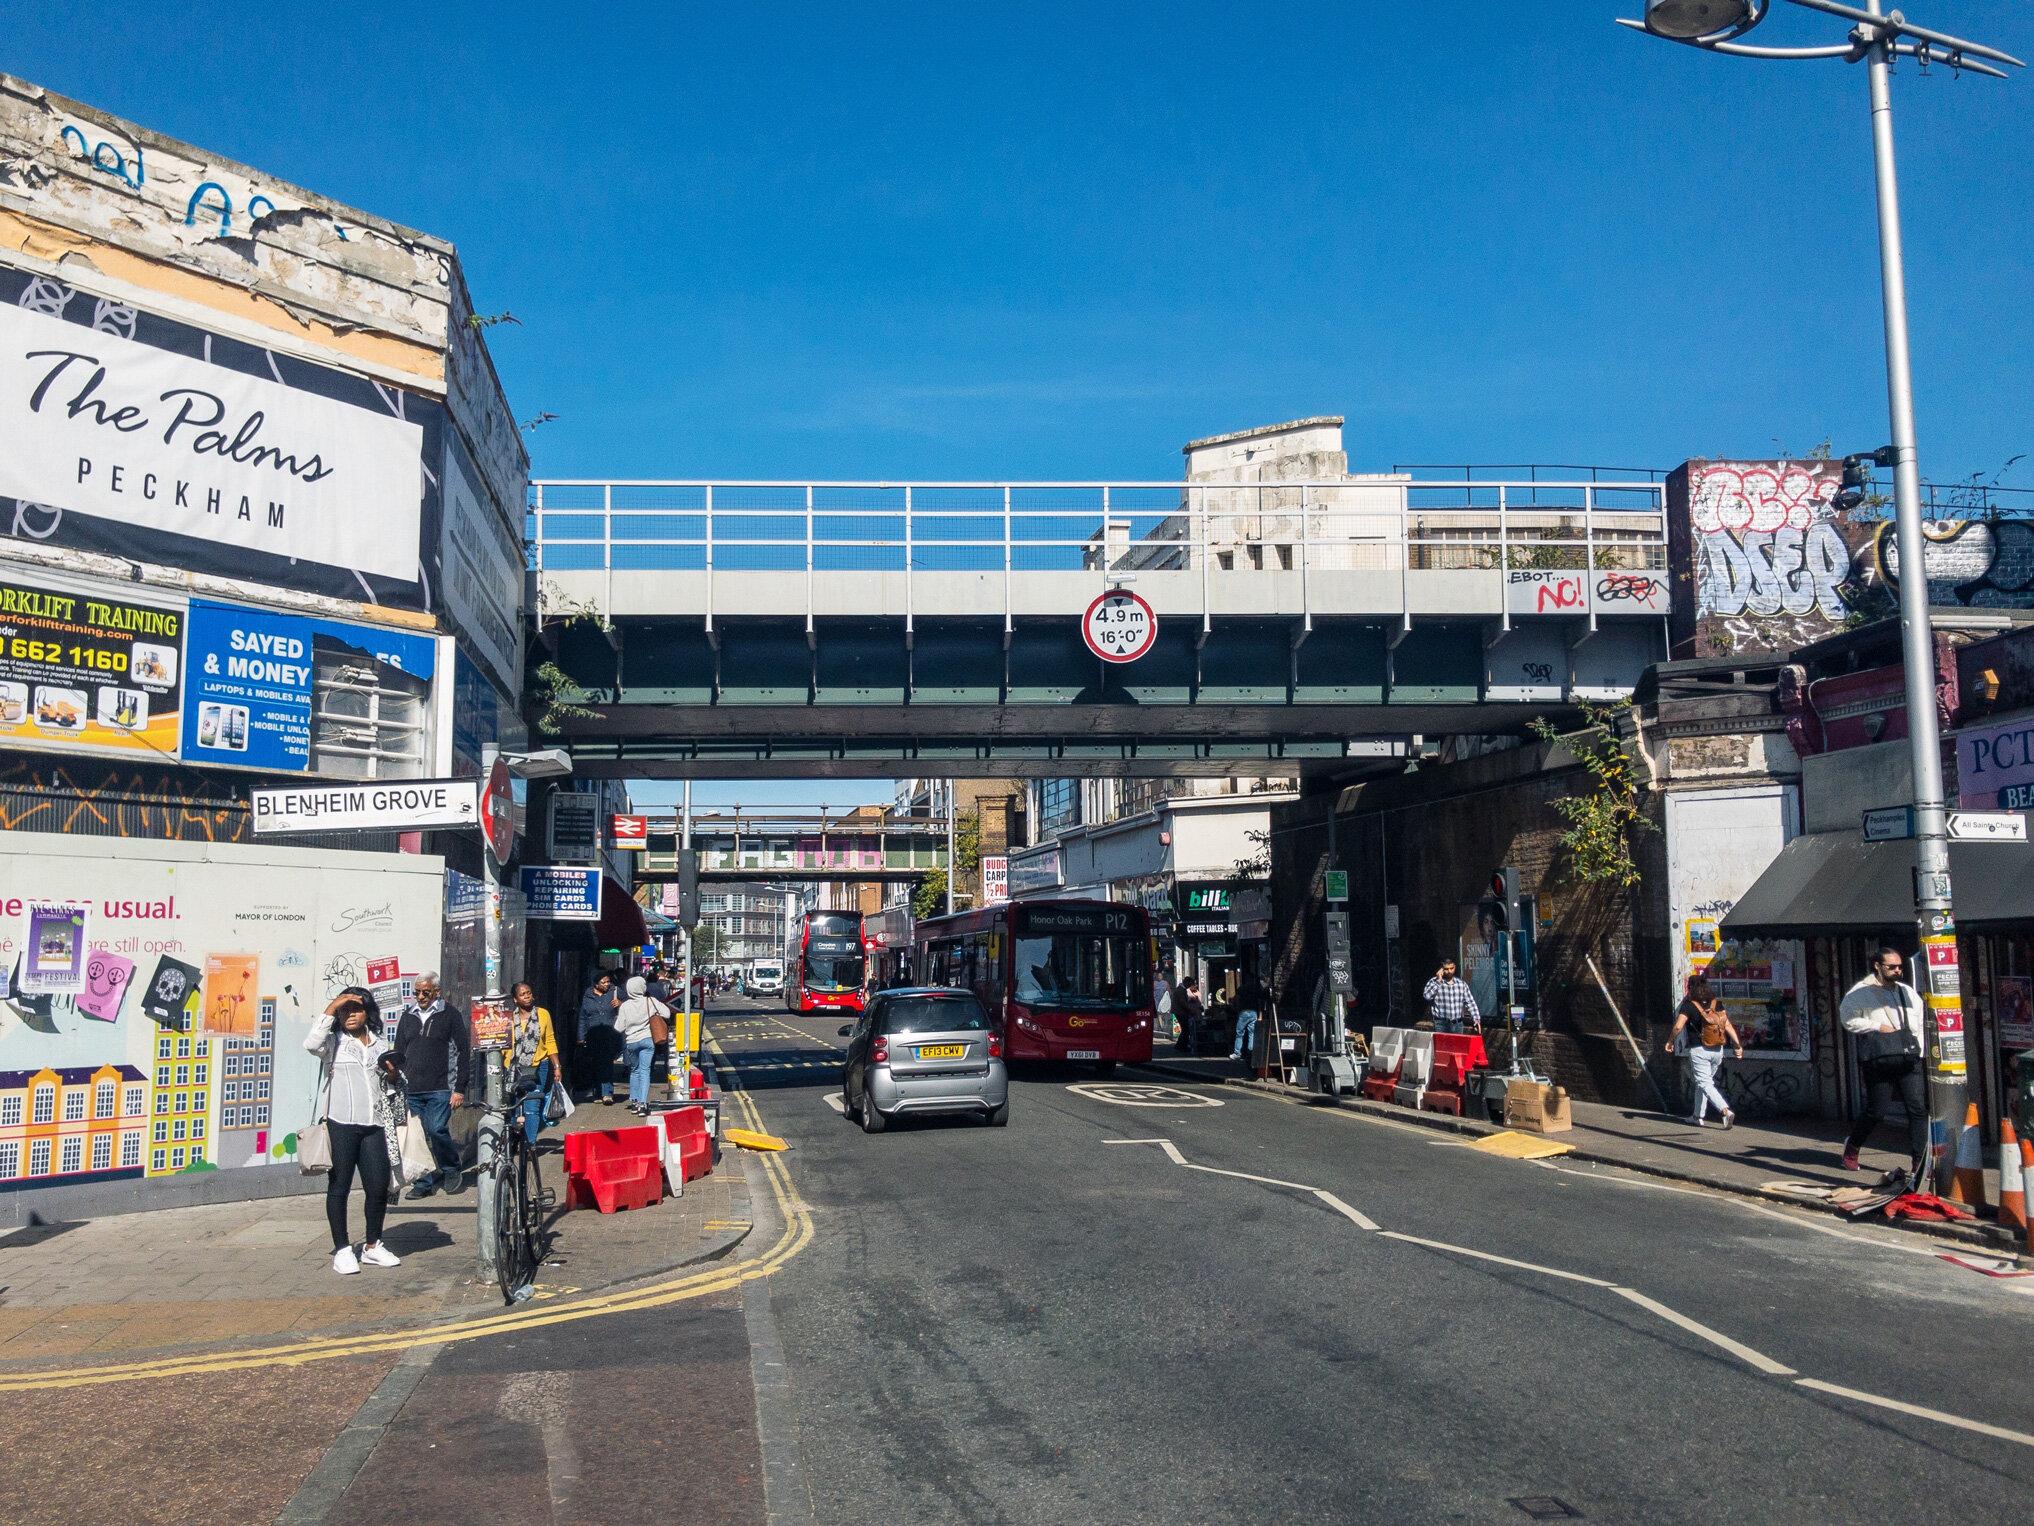 Peckham-Rye-Lane-London.jpg